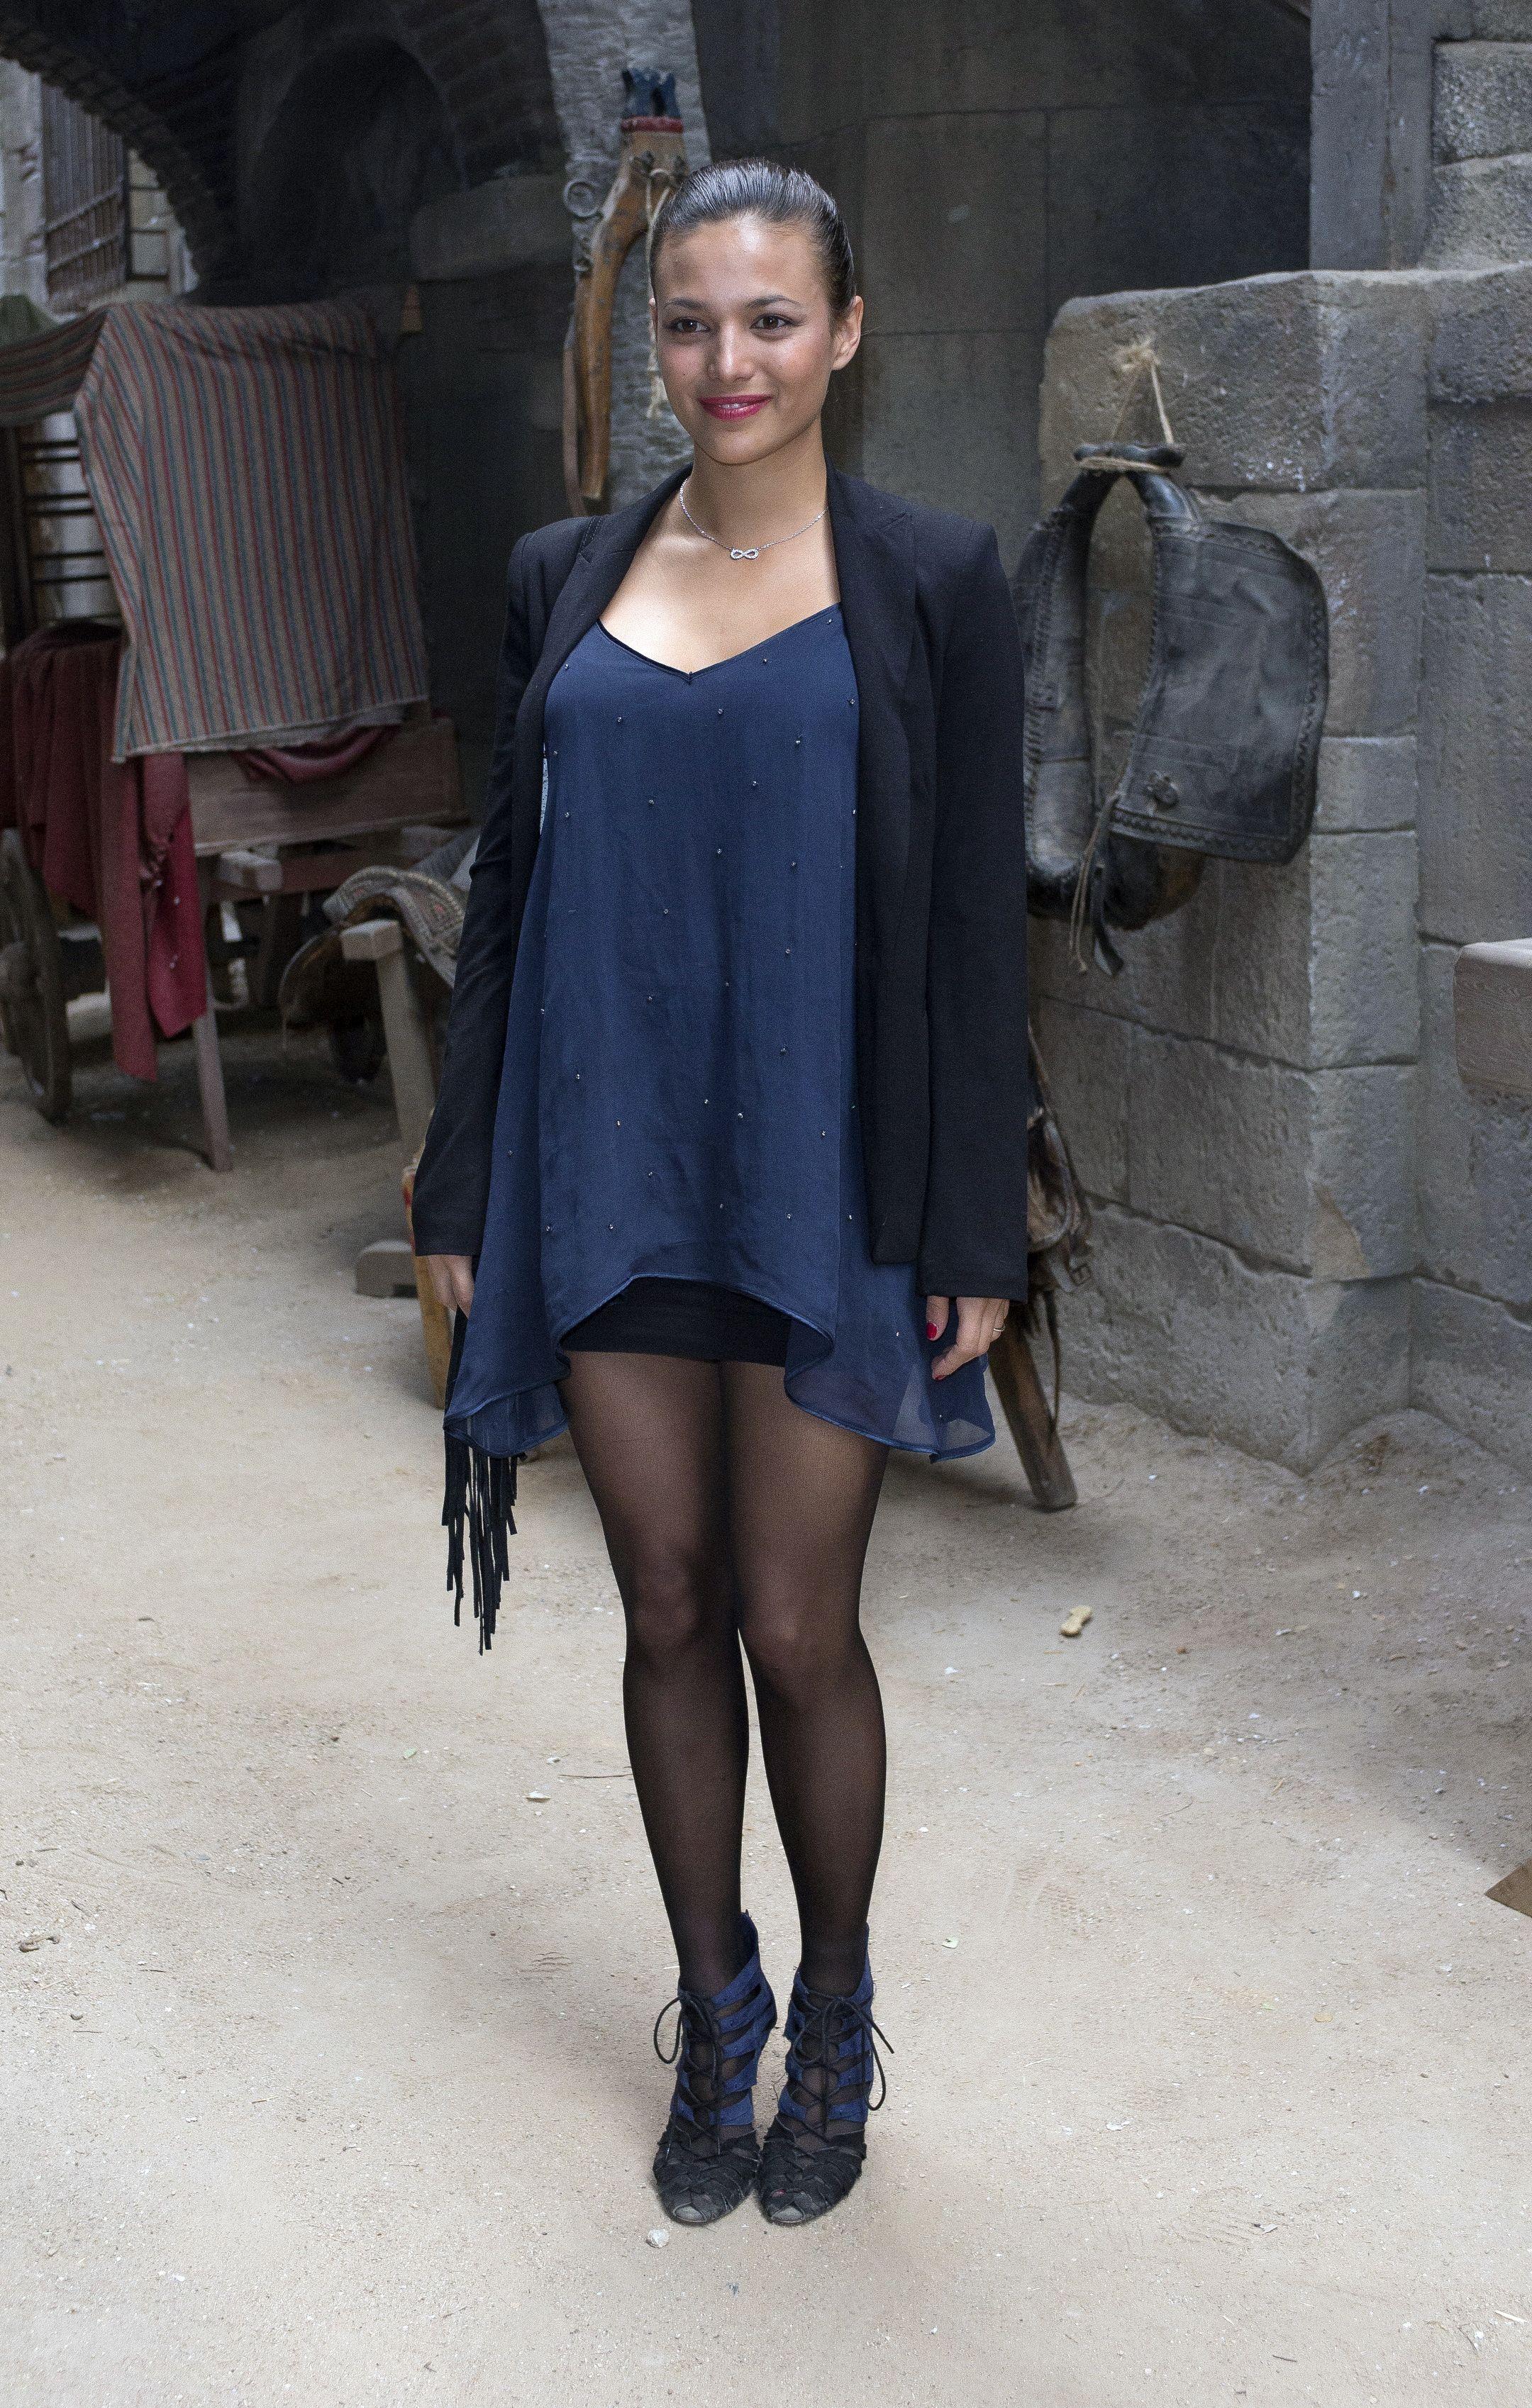 Ana Garcia Siñeriz Topless elisa mouliaa en 2020